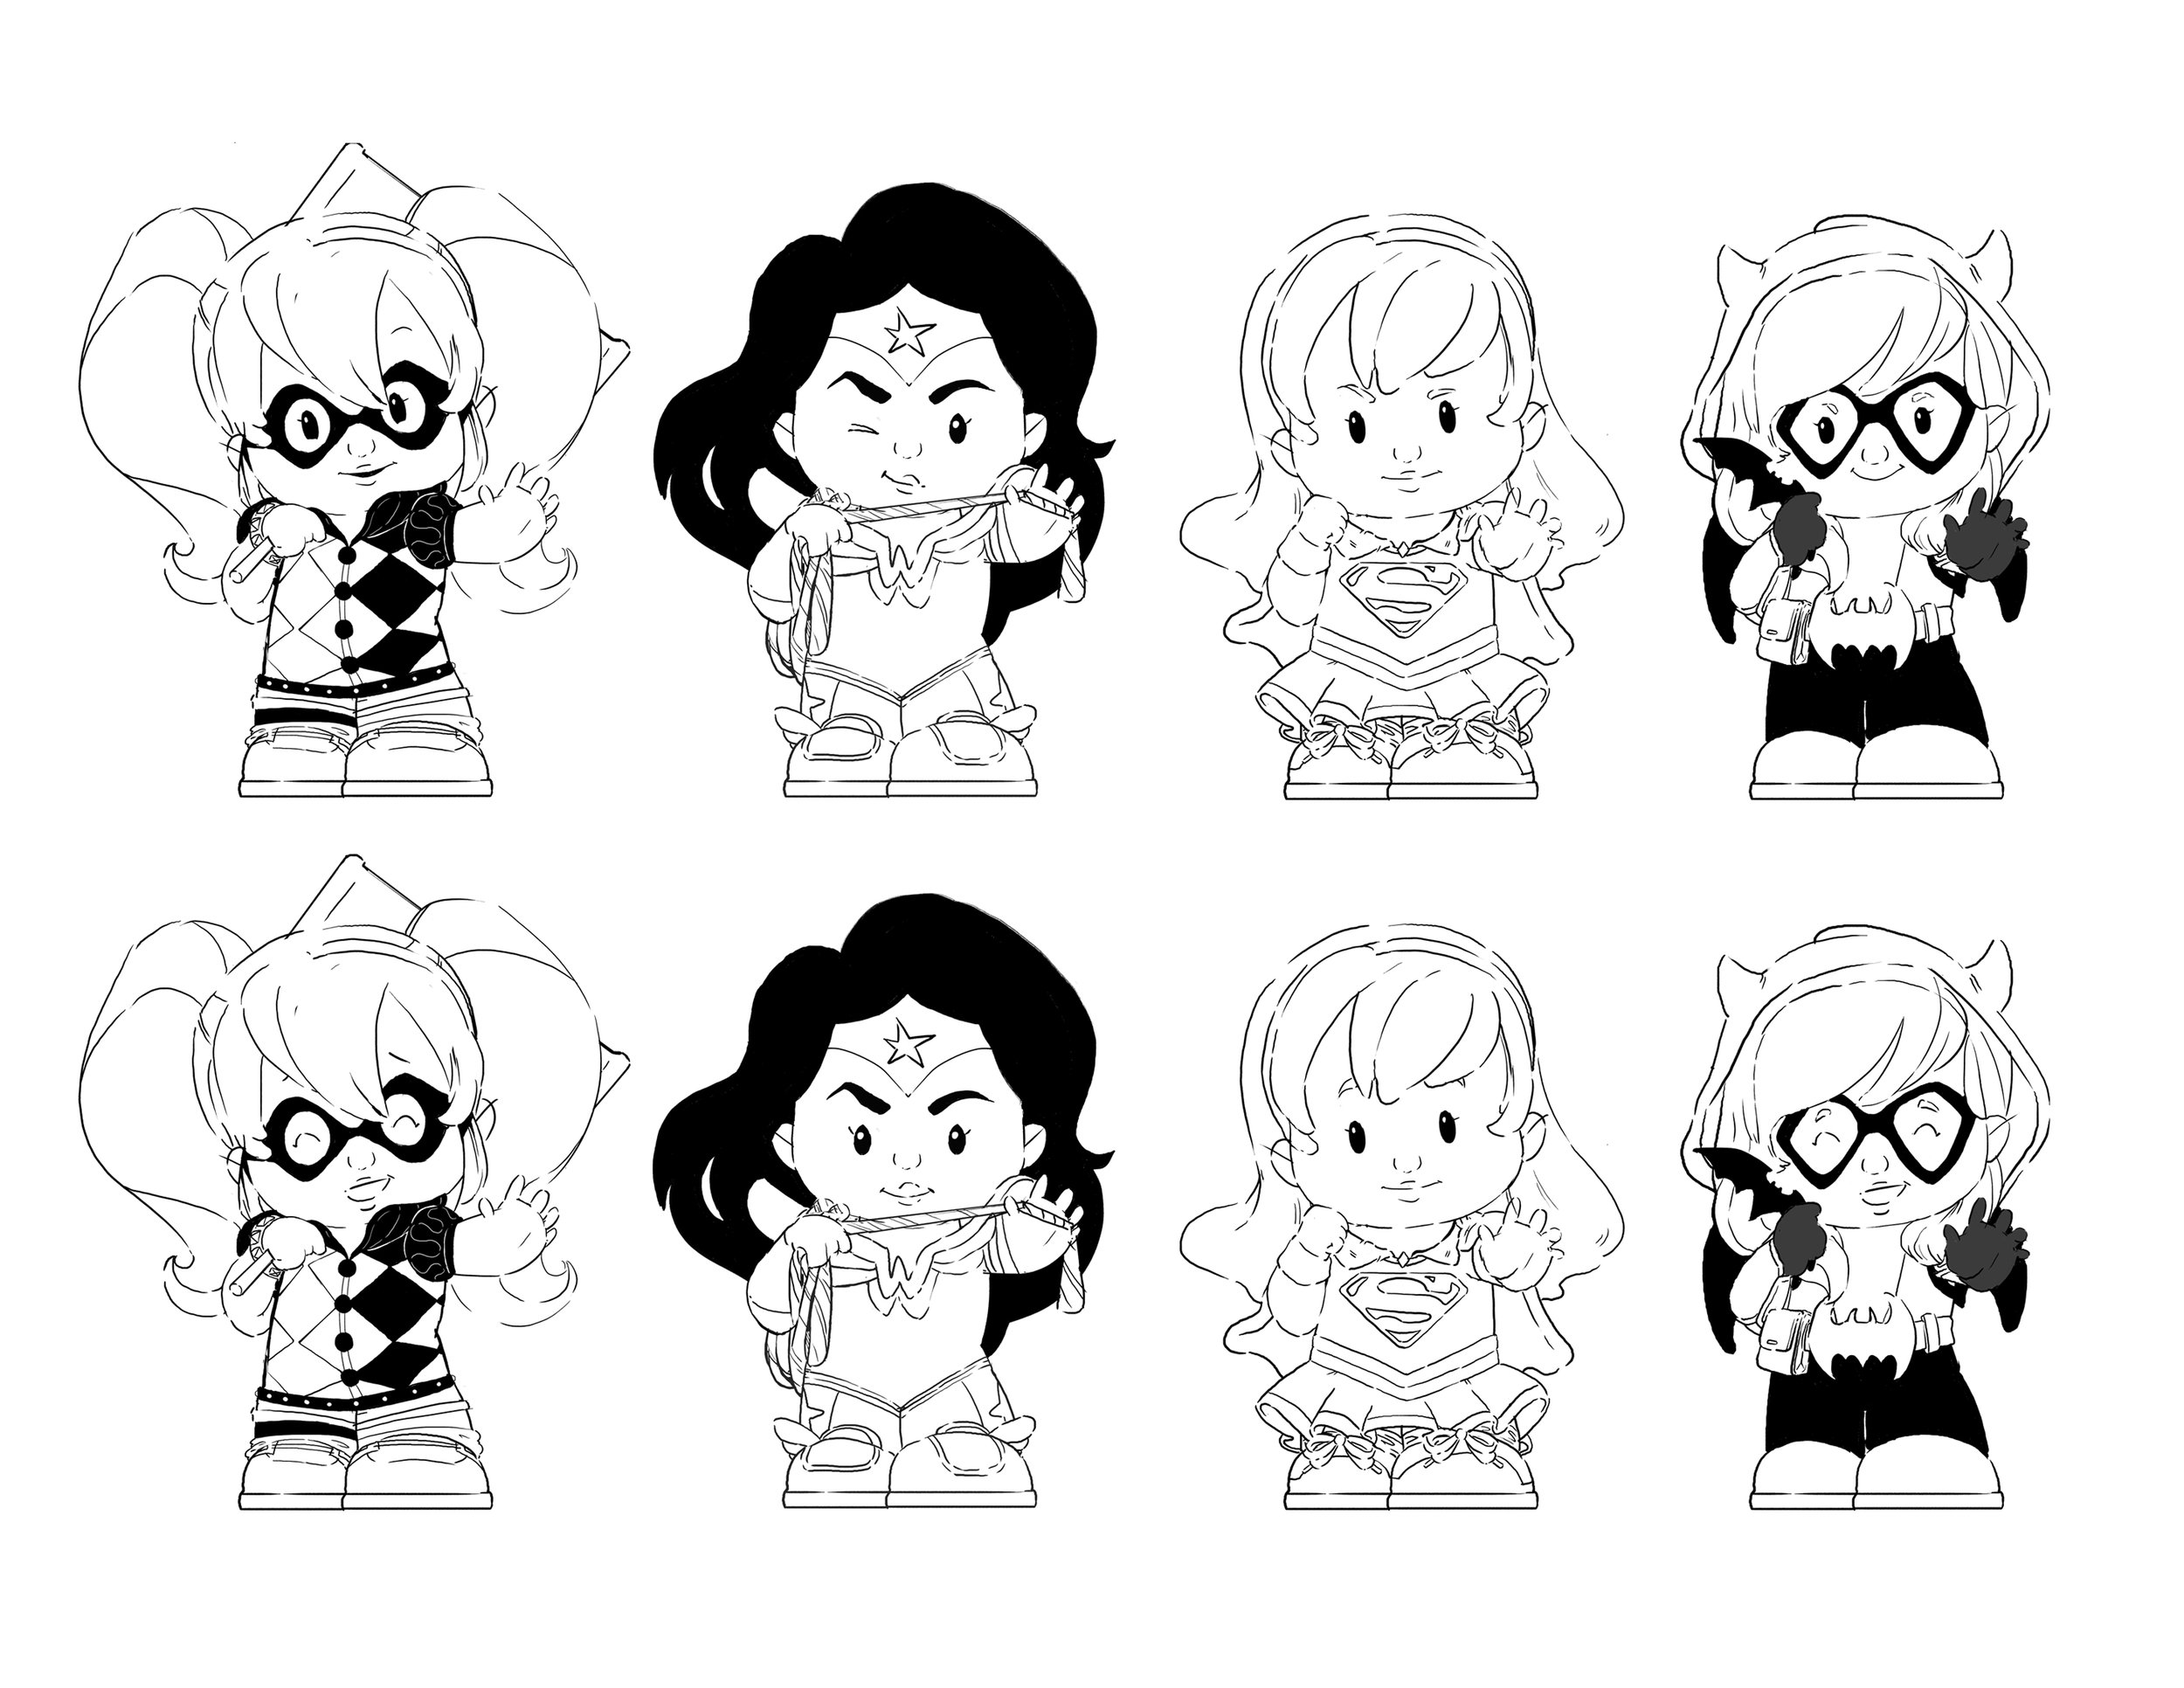 DC Super Hero Girls Figurines: Harley Quinn, Wonder Woman, Supergirl, Batgirl